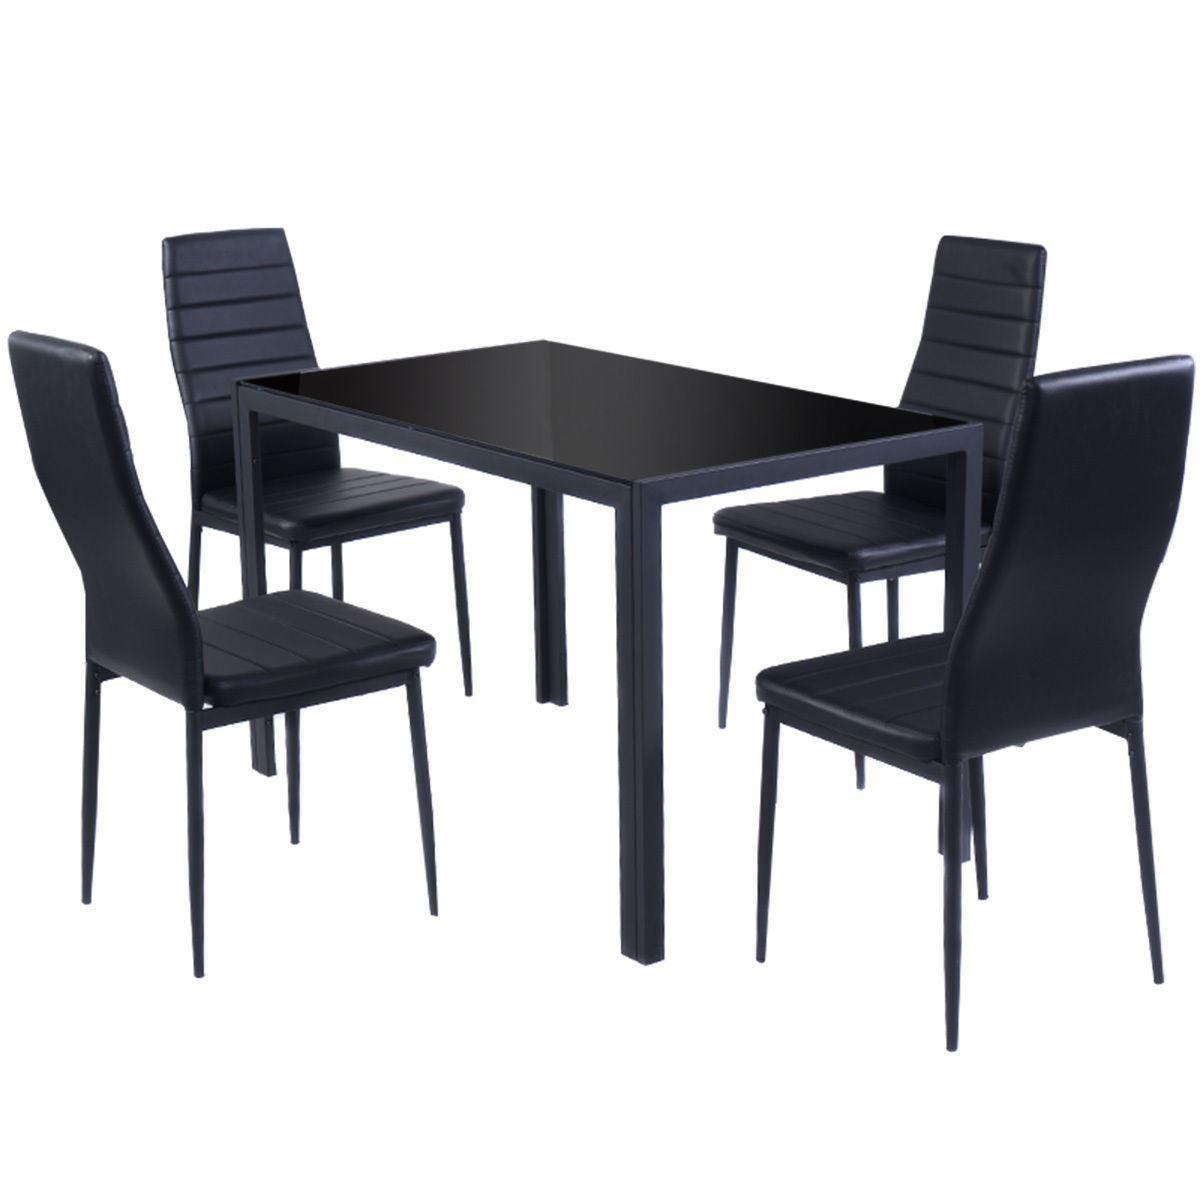 Picture of Kitchen Furniture Set - Black